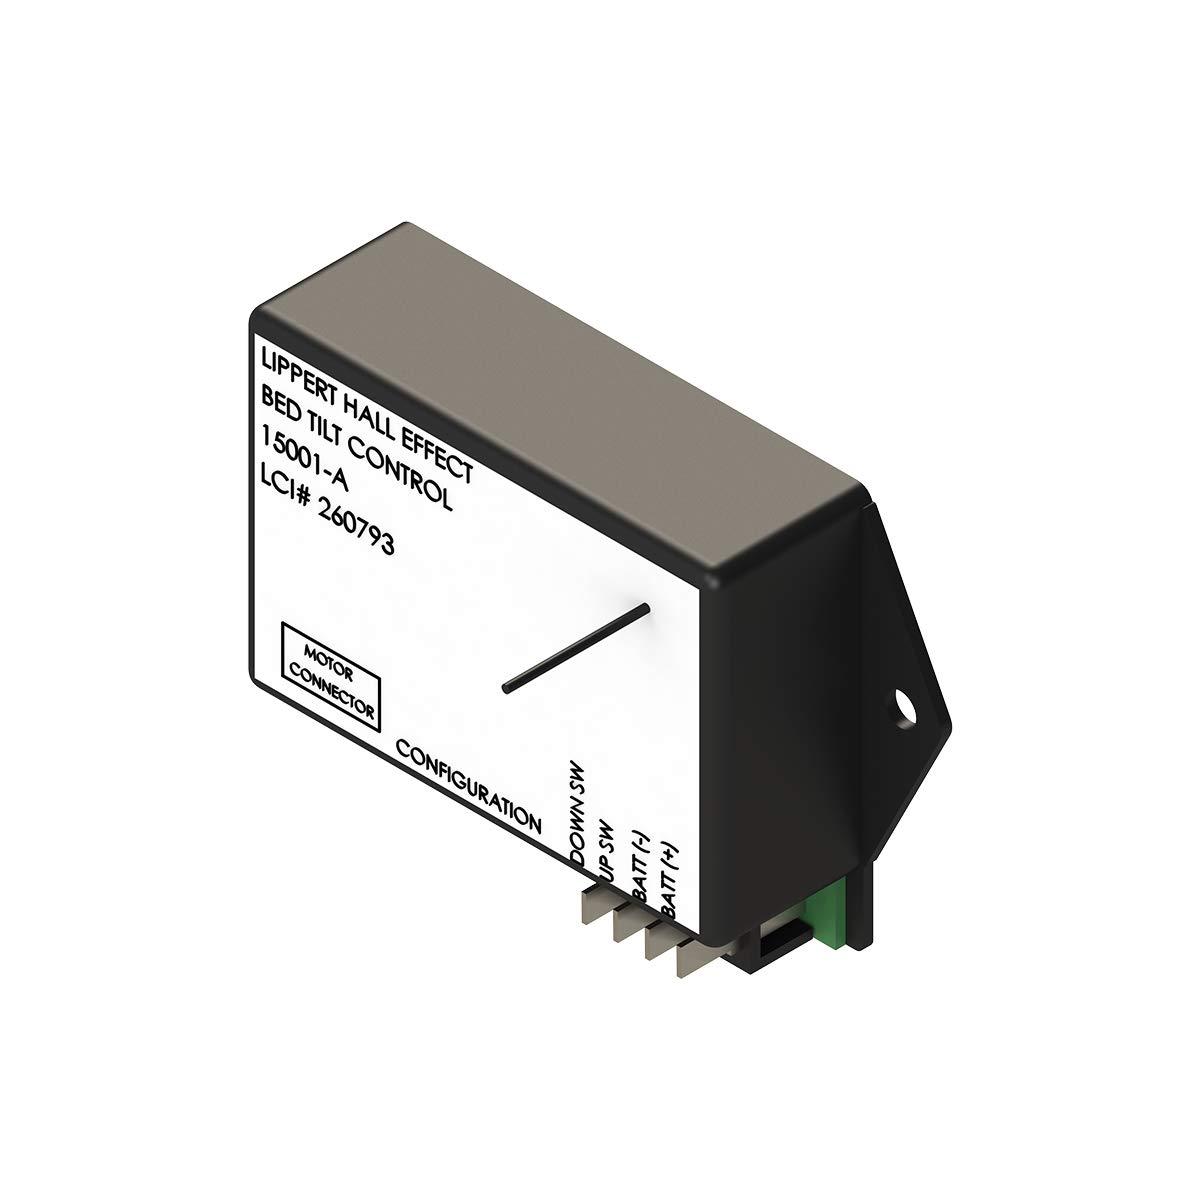 Lippert Components 260793 Bed Tilt Control Module